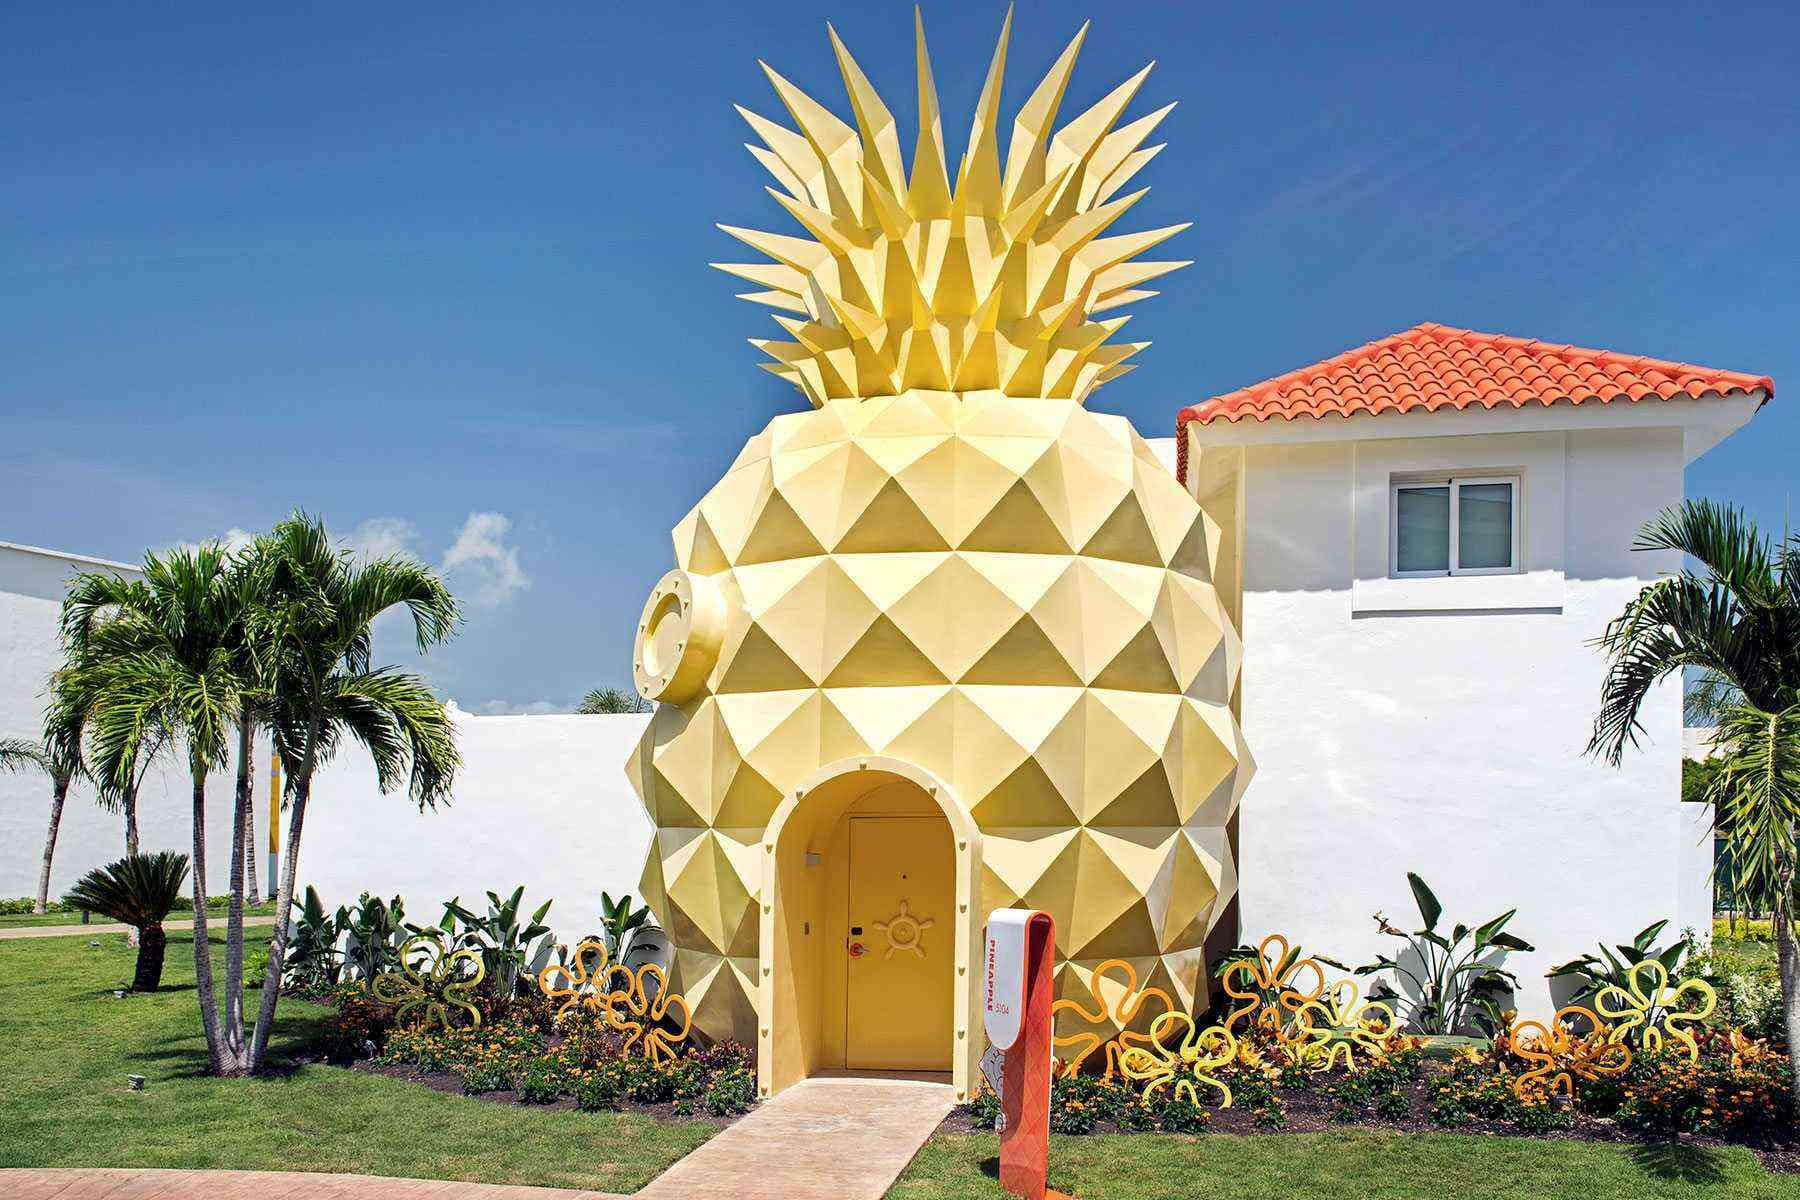 Weird-Airbnbs-Spongebob-Pineapple-1